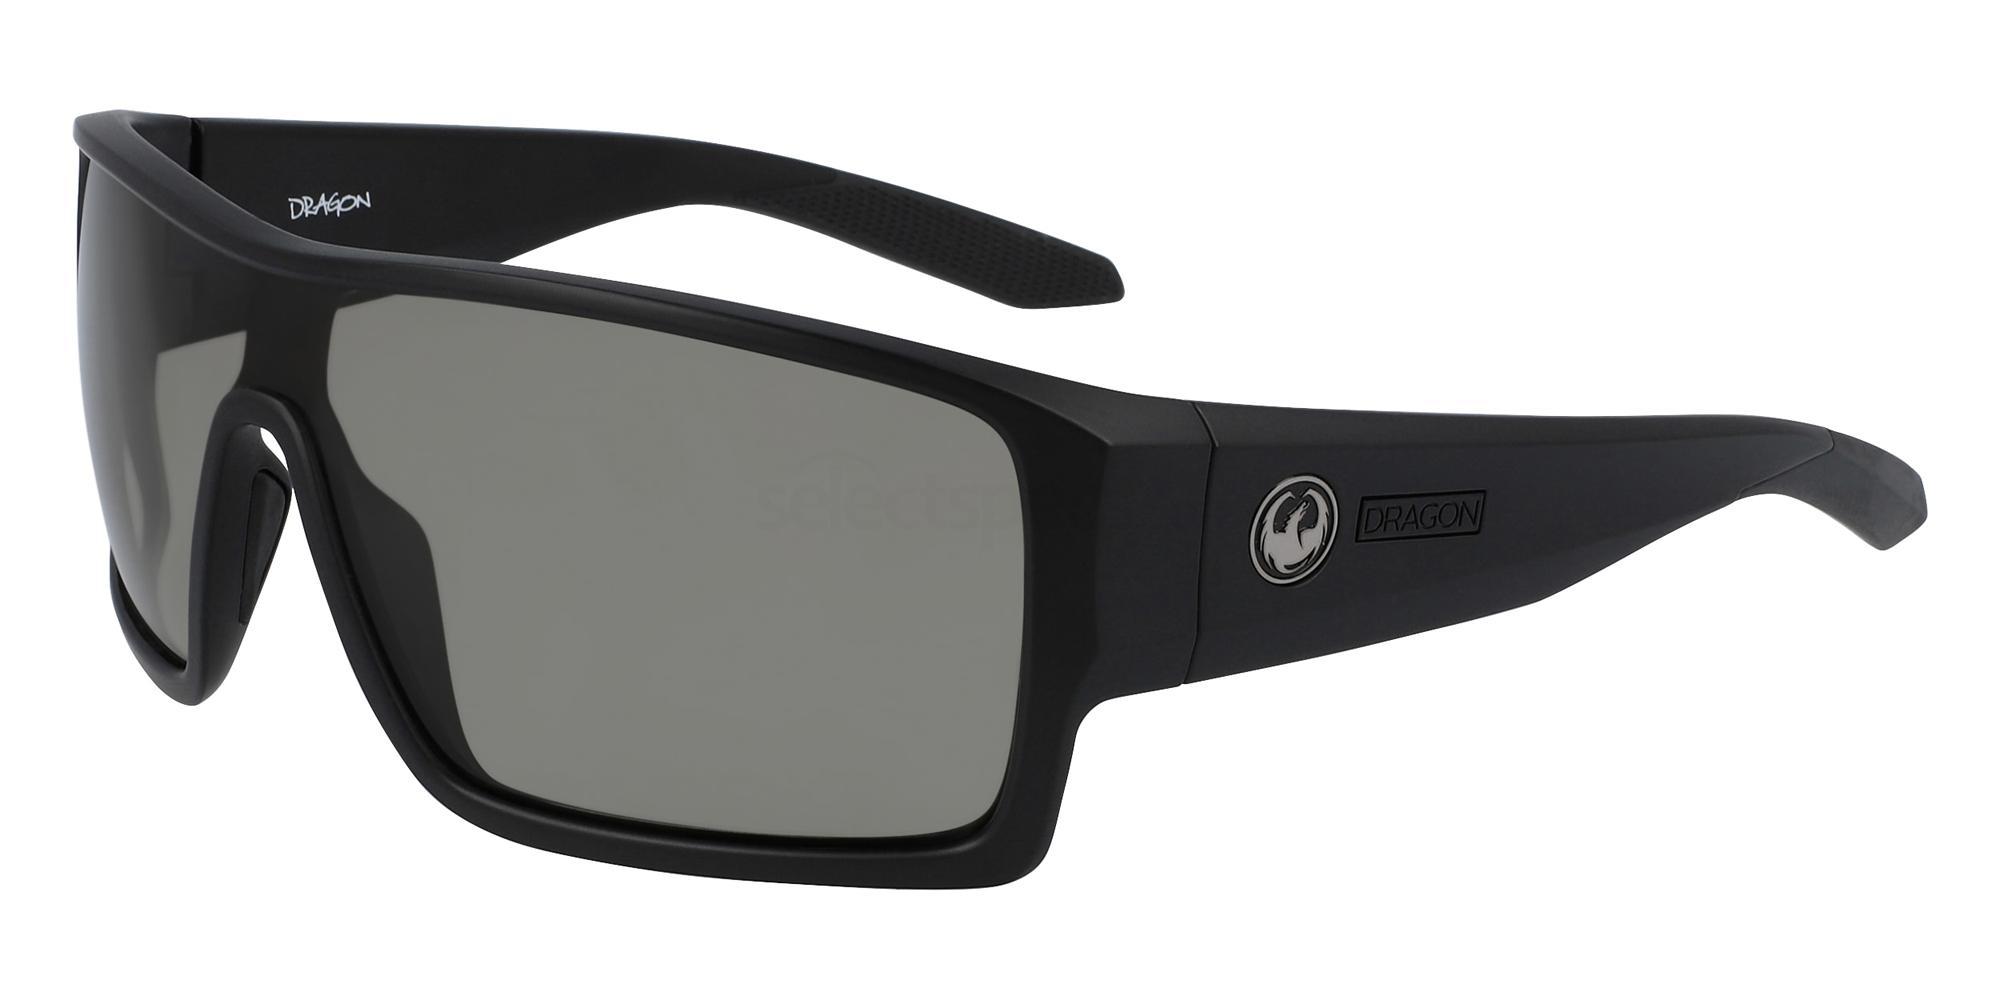 002 DR FLASH LL POLAR Sunglasses, Dragon